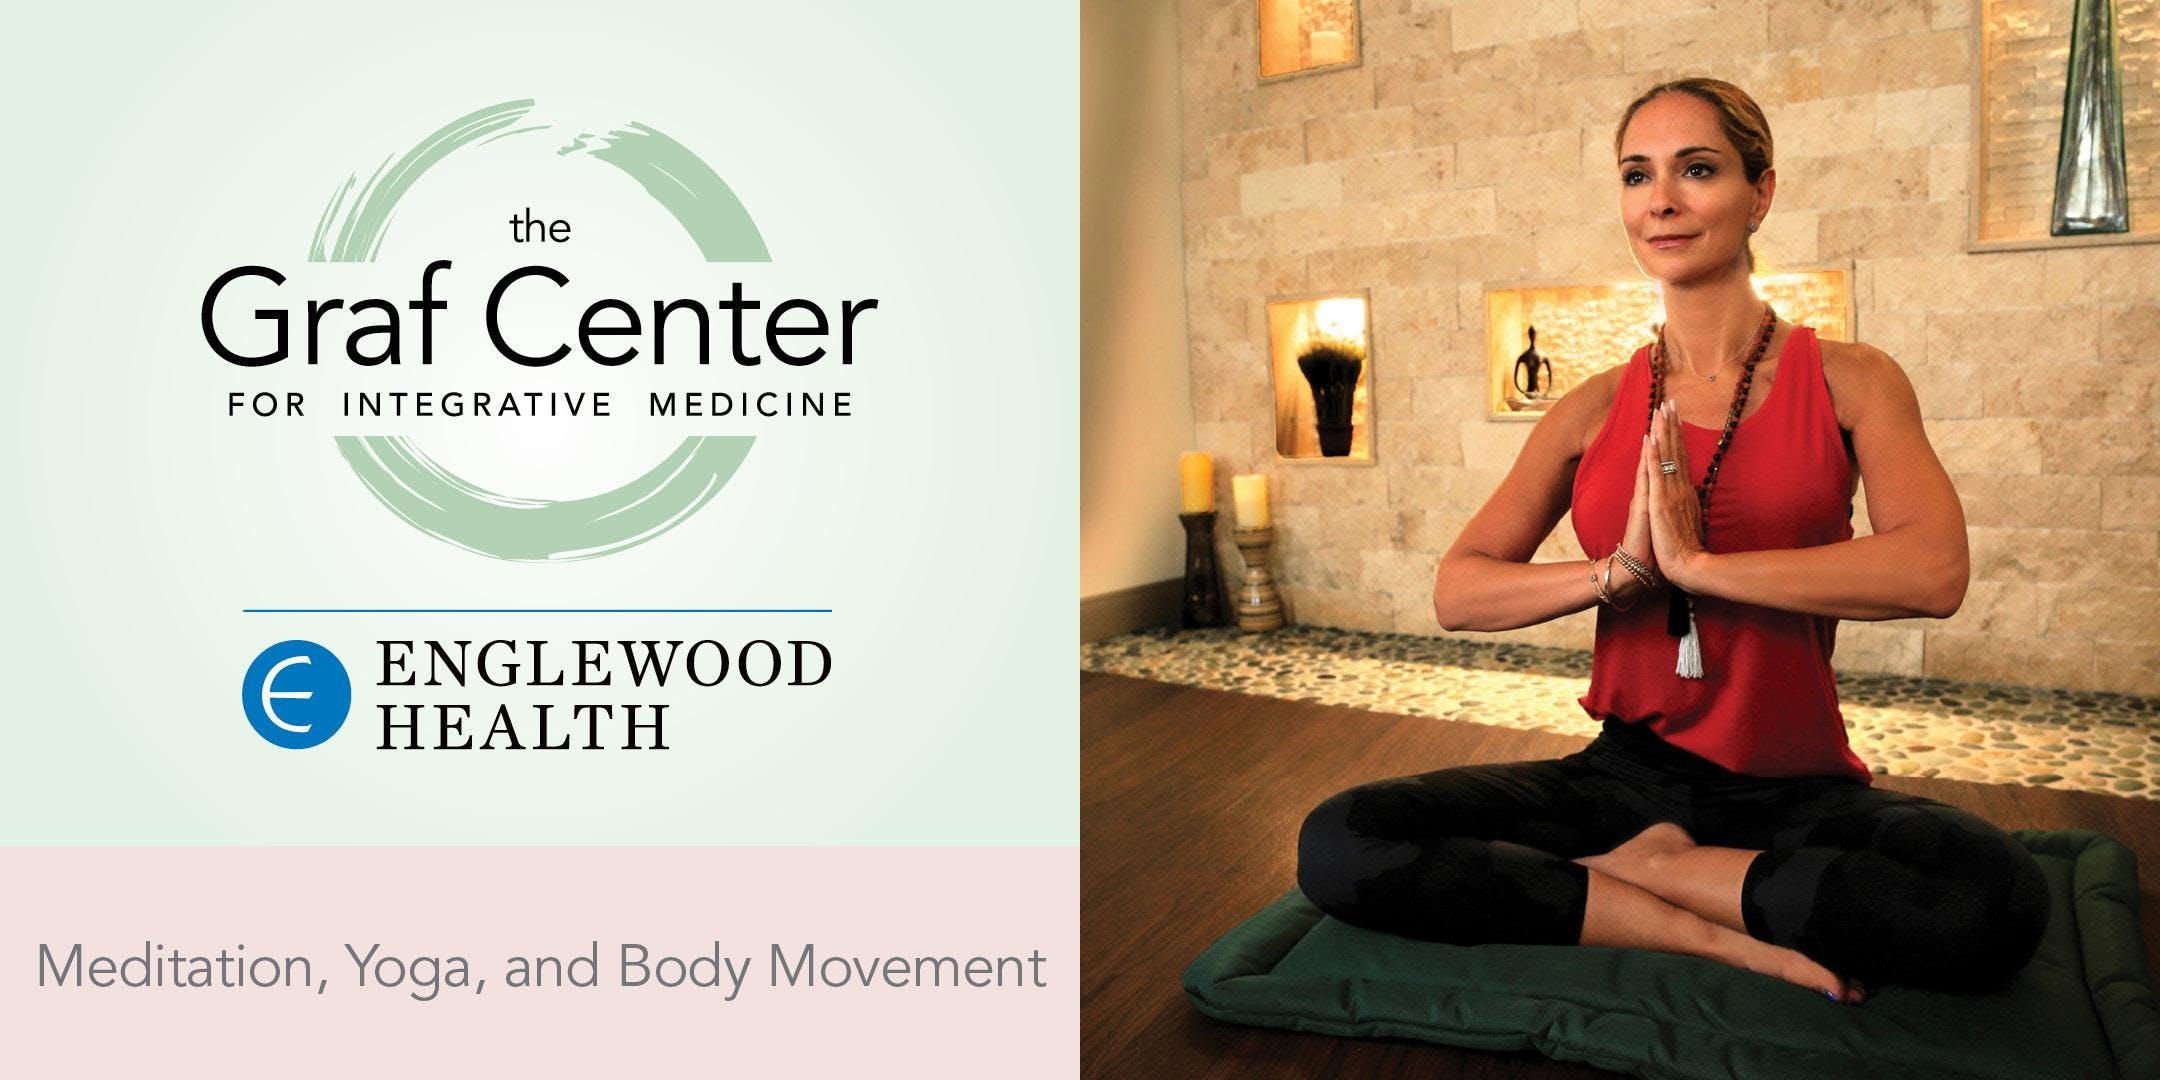 More info: Yoga with Jennifer Graf